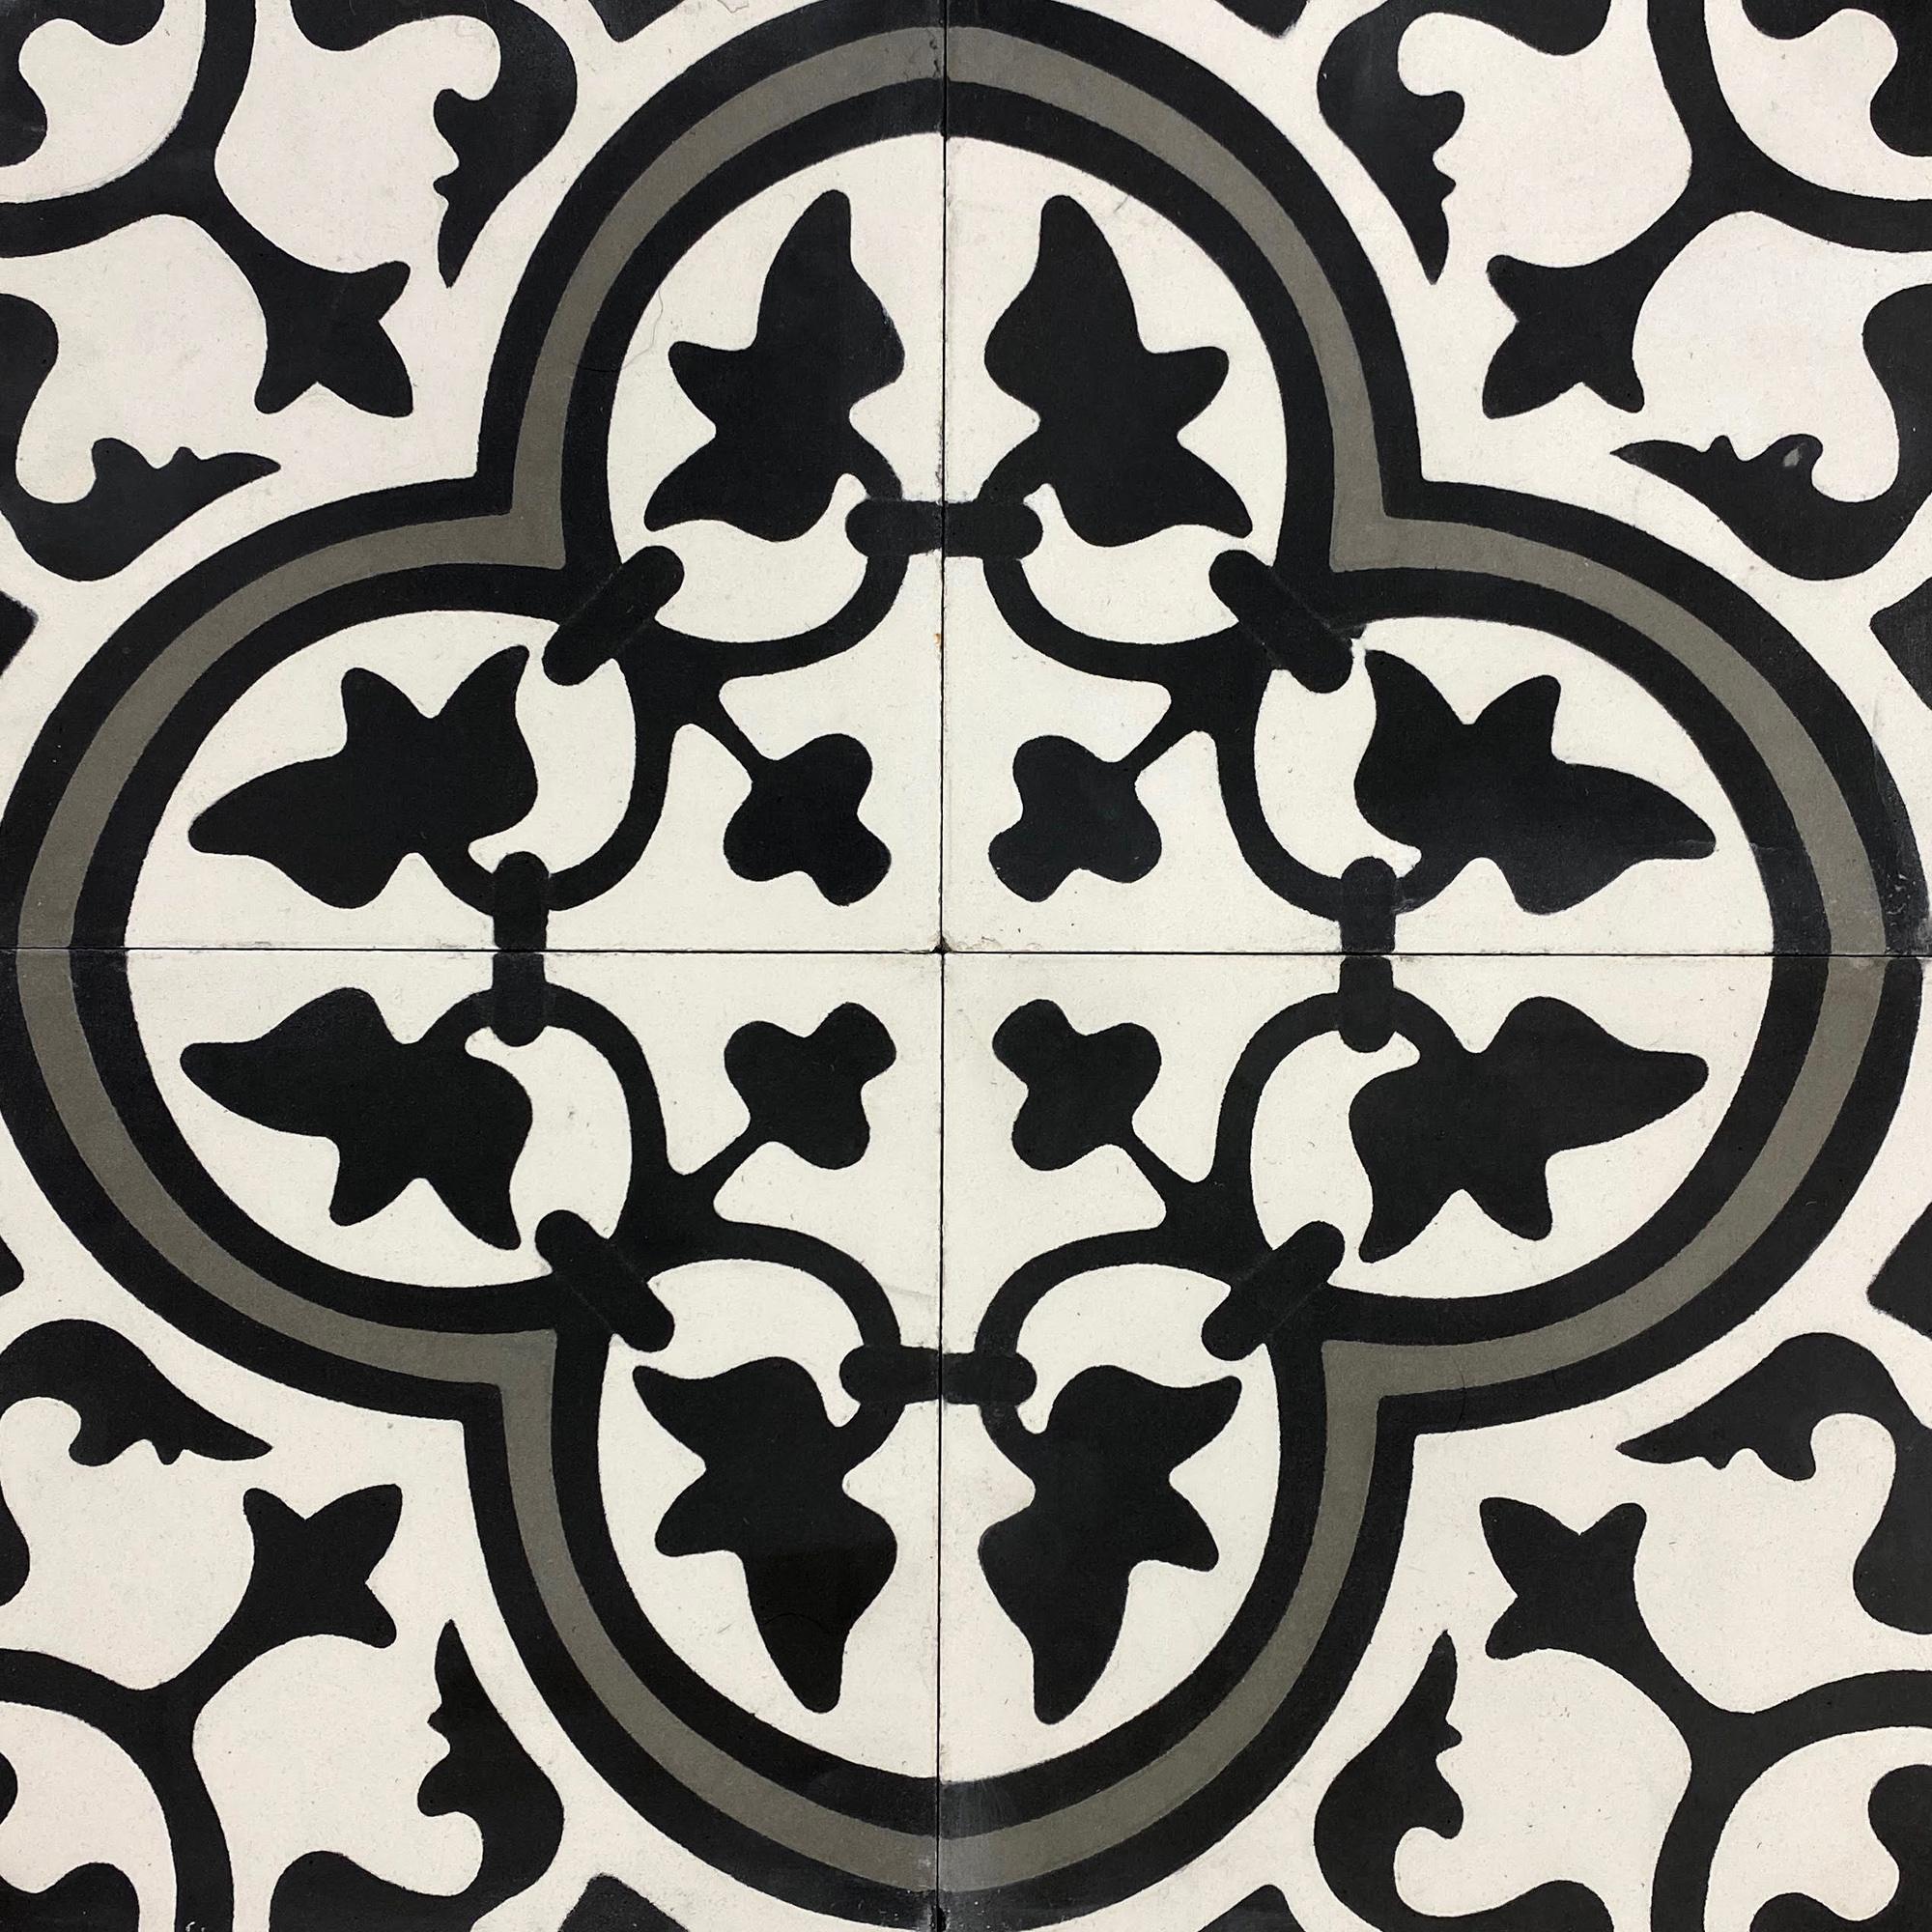 Koni Cement Tile KCT 01